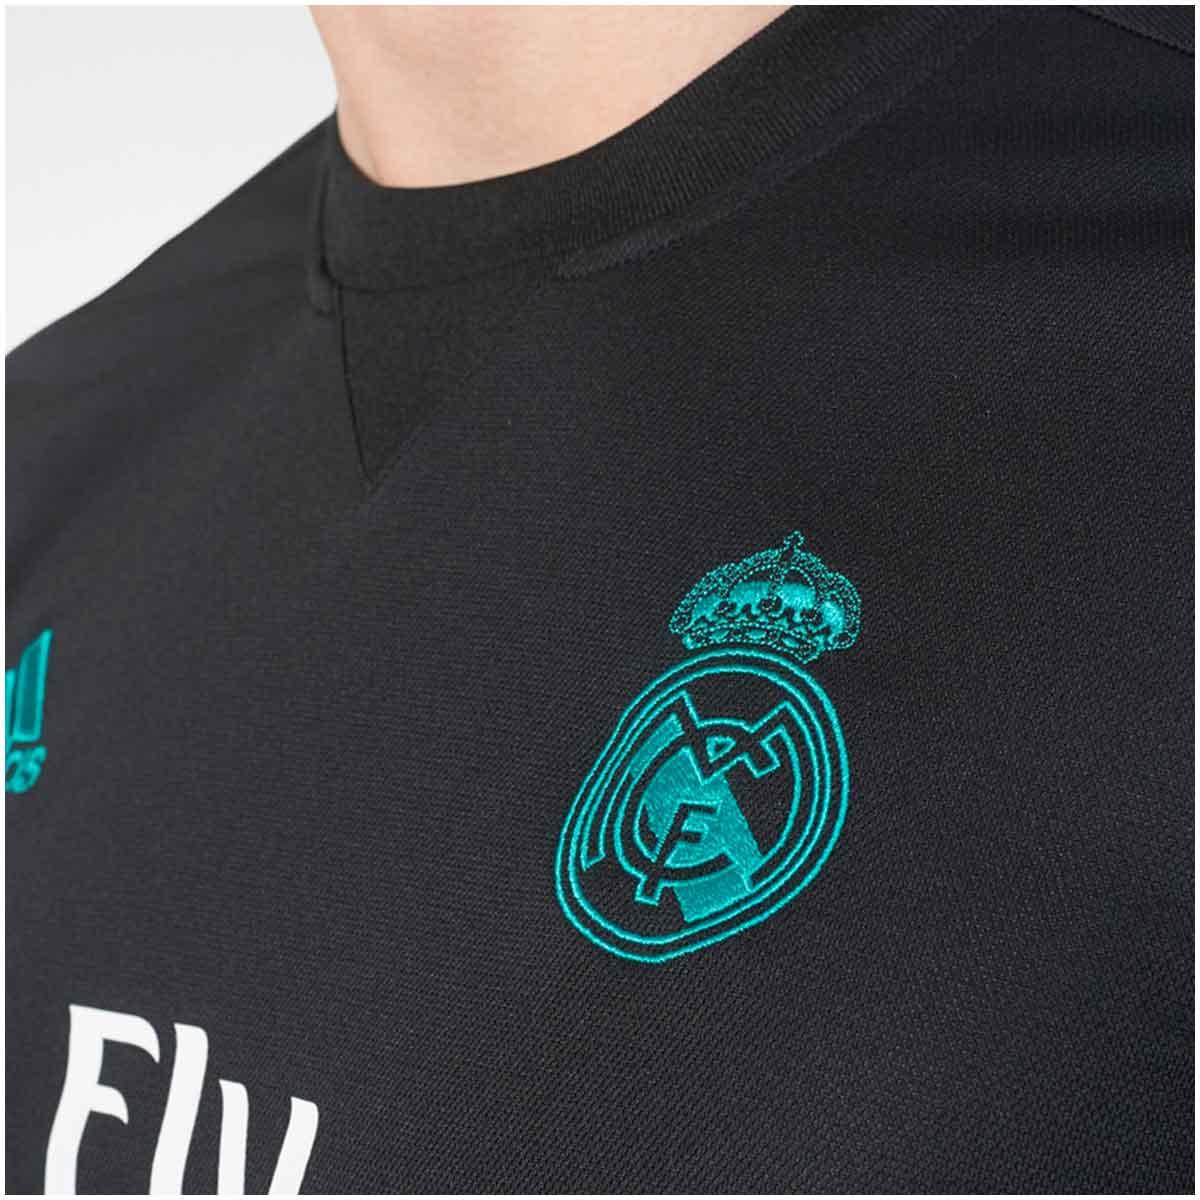 Camisa Real Madrid Away Adidas 2017/18